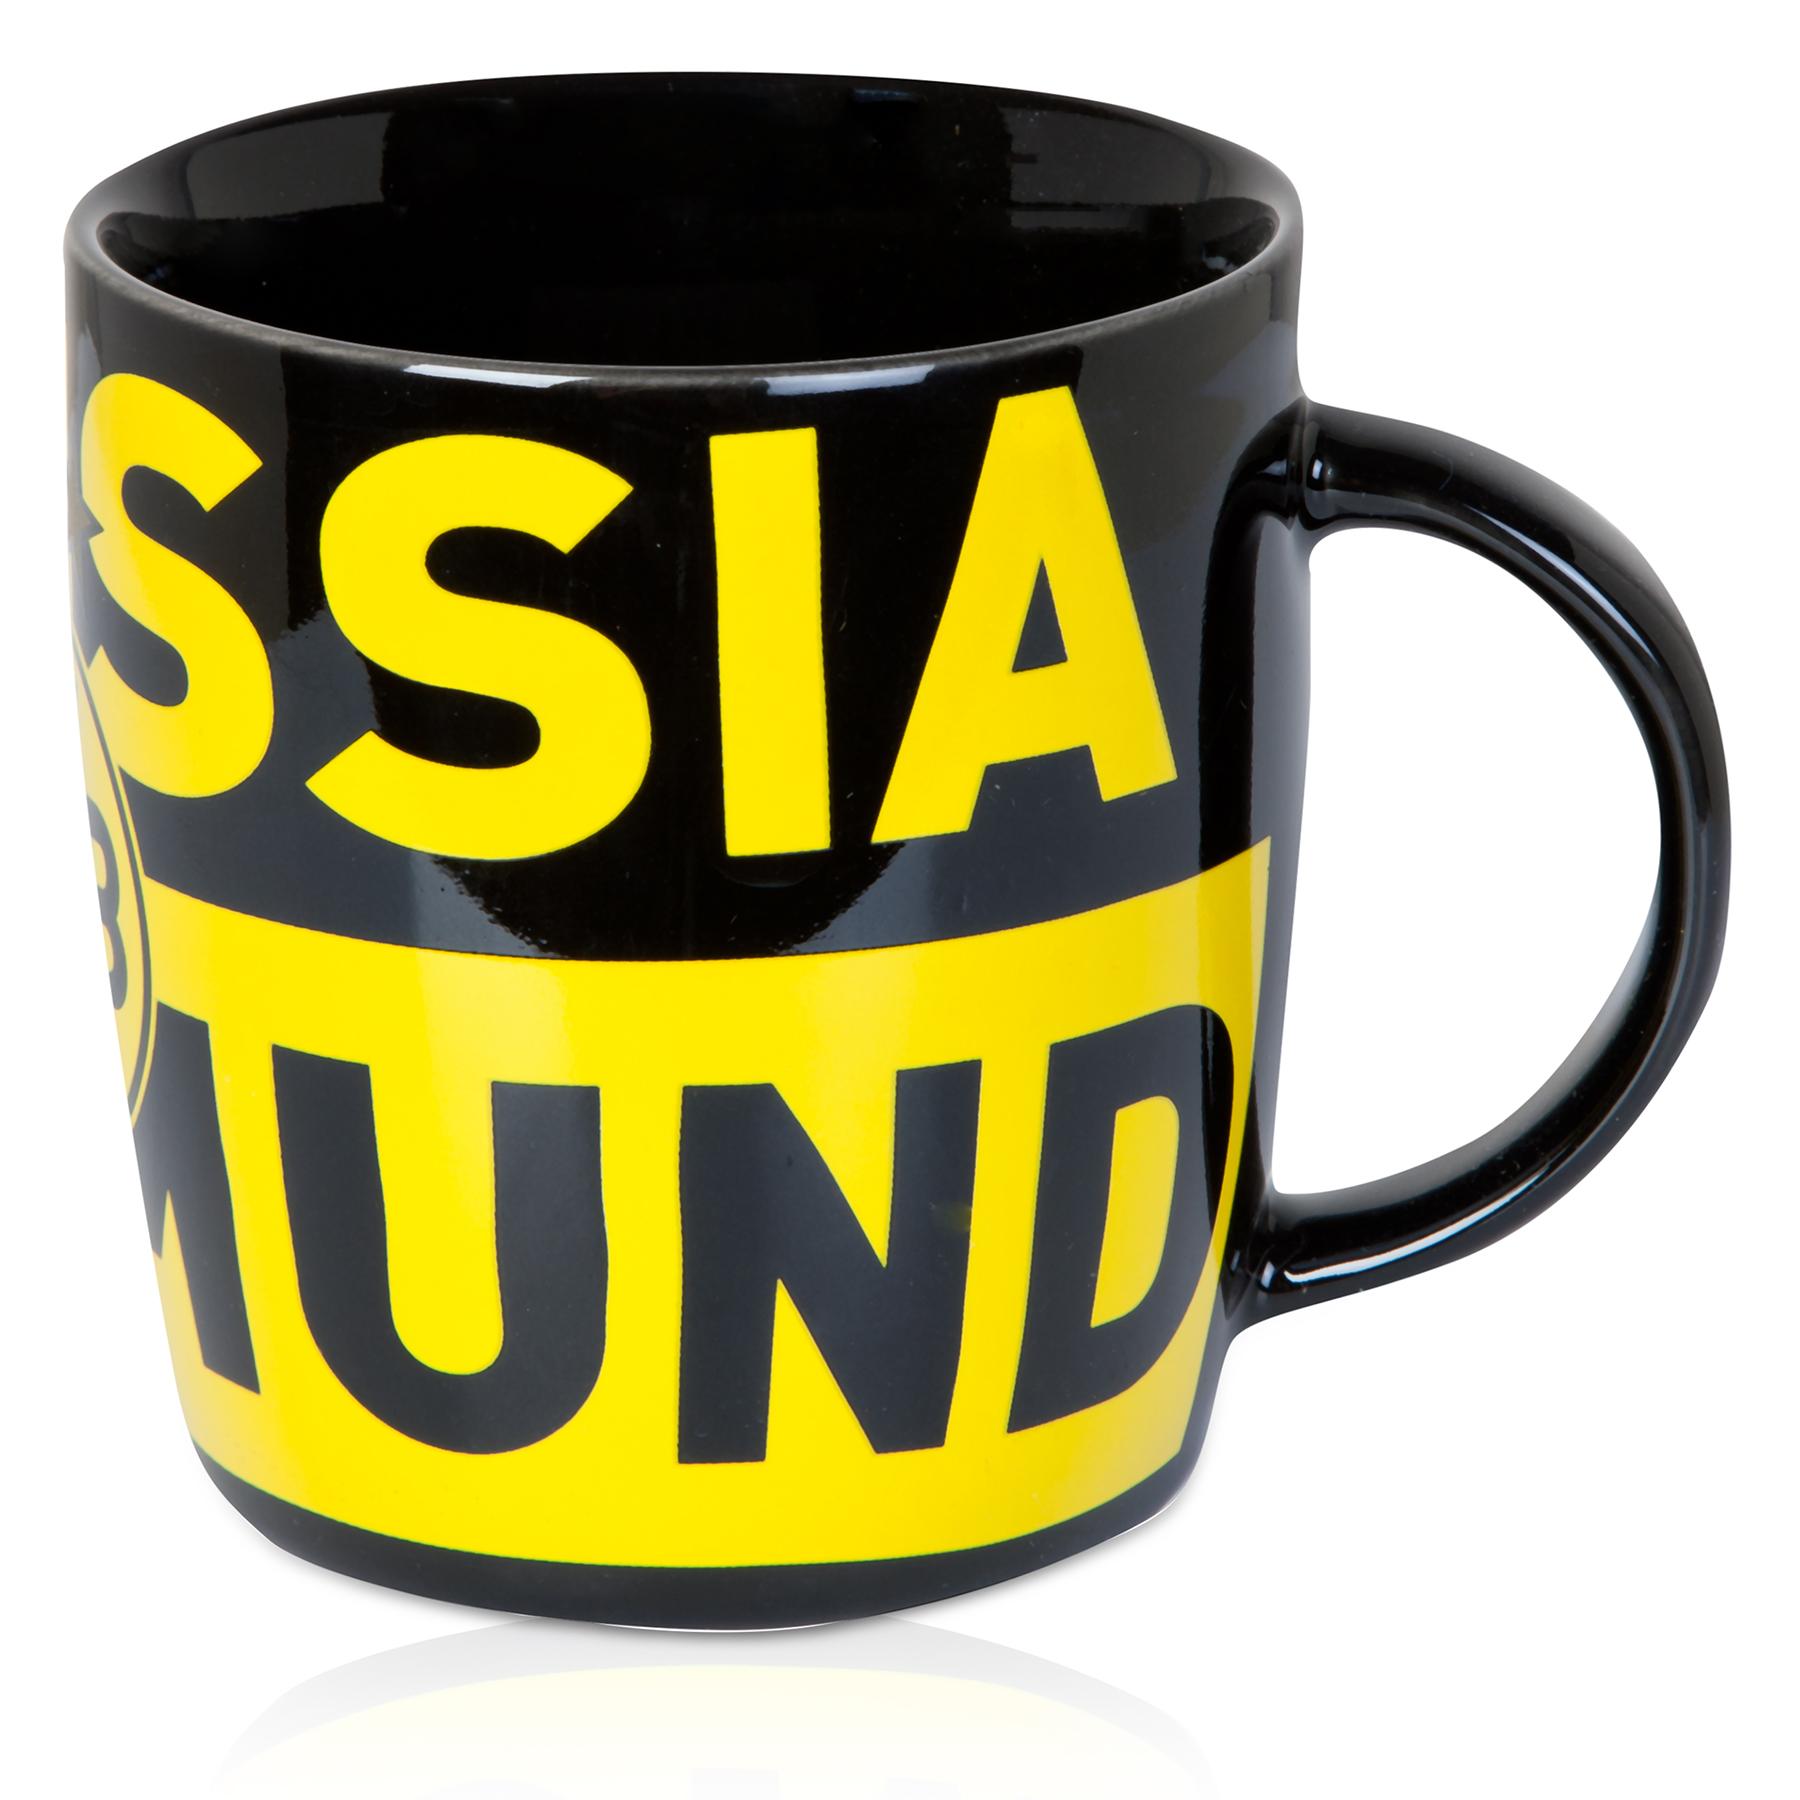 Image of BVB Borussia Dortmund Mug